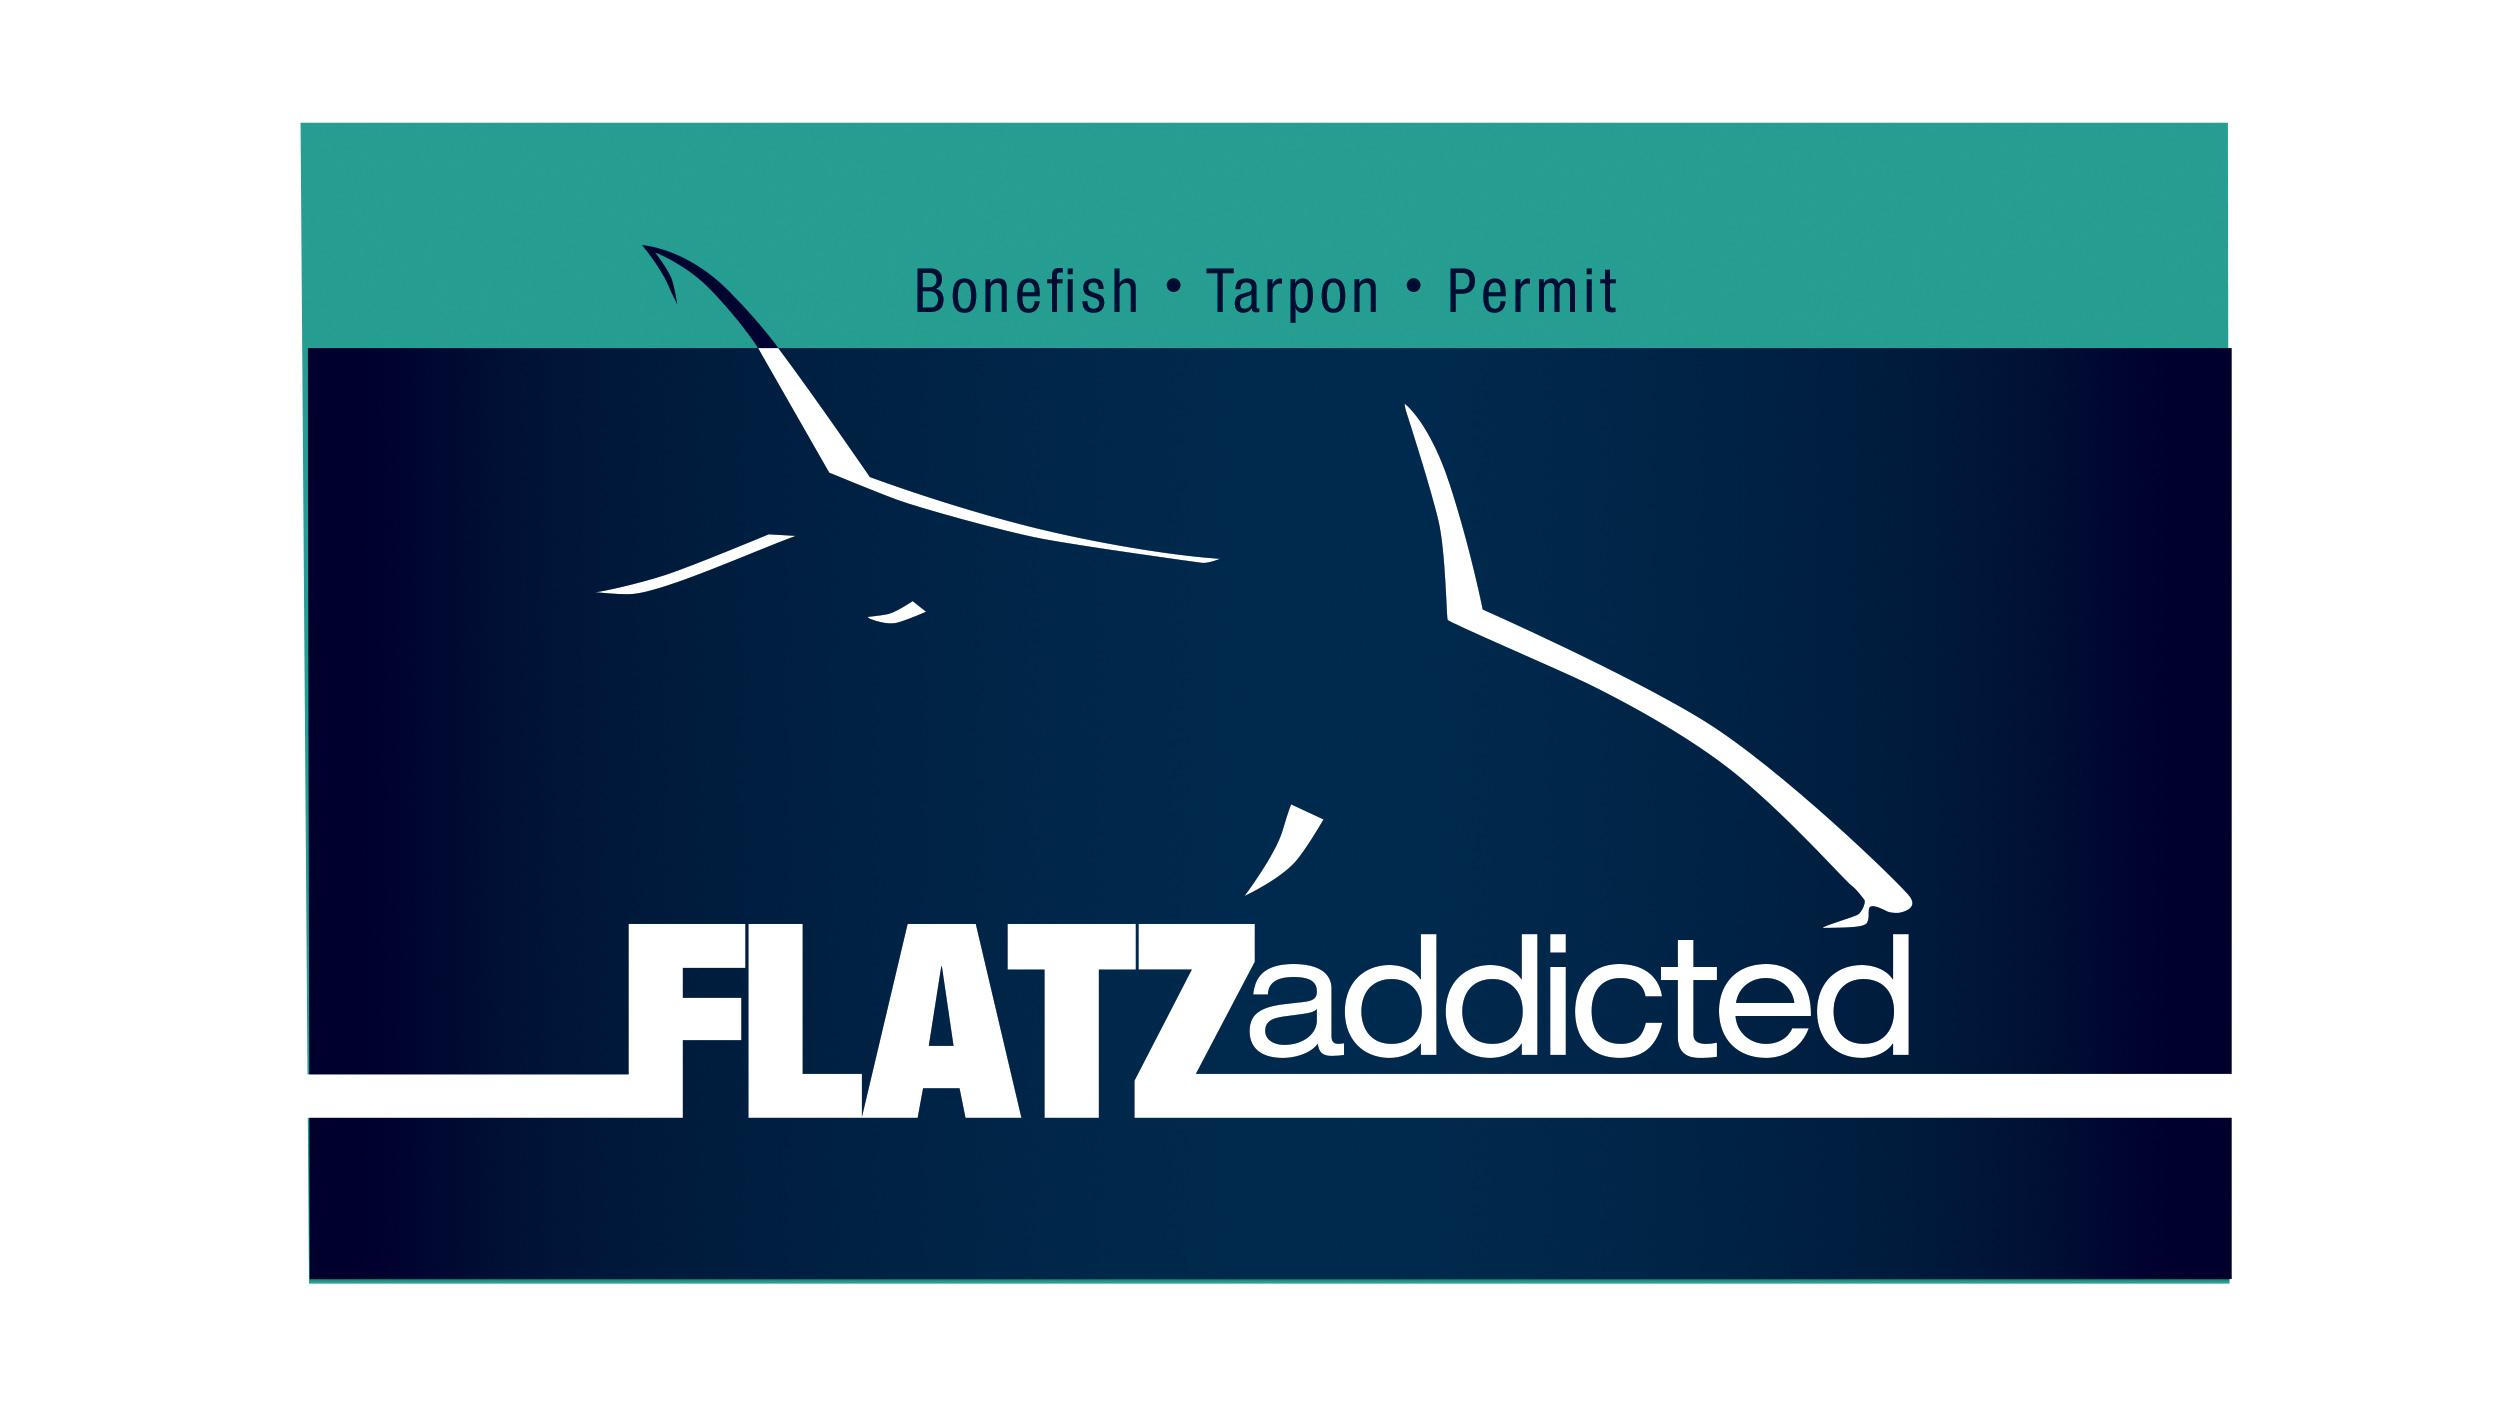 Flats-addicted-fishing-charters-Logos-Brand-Identity.jpg